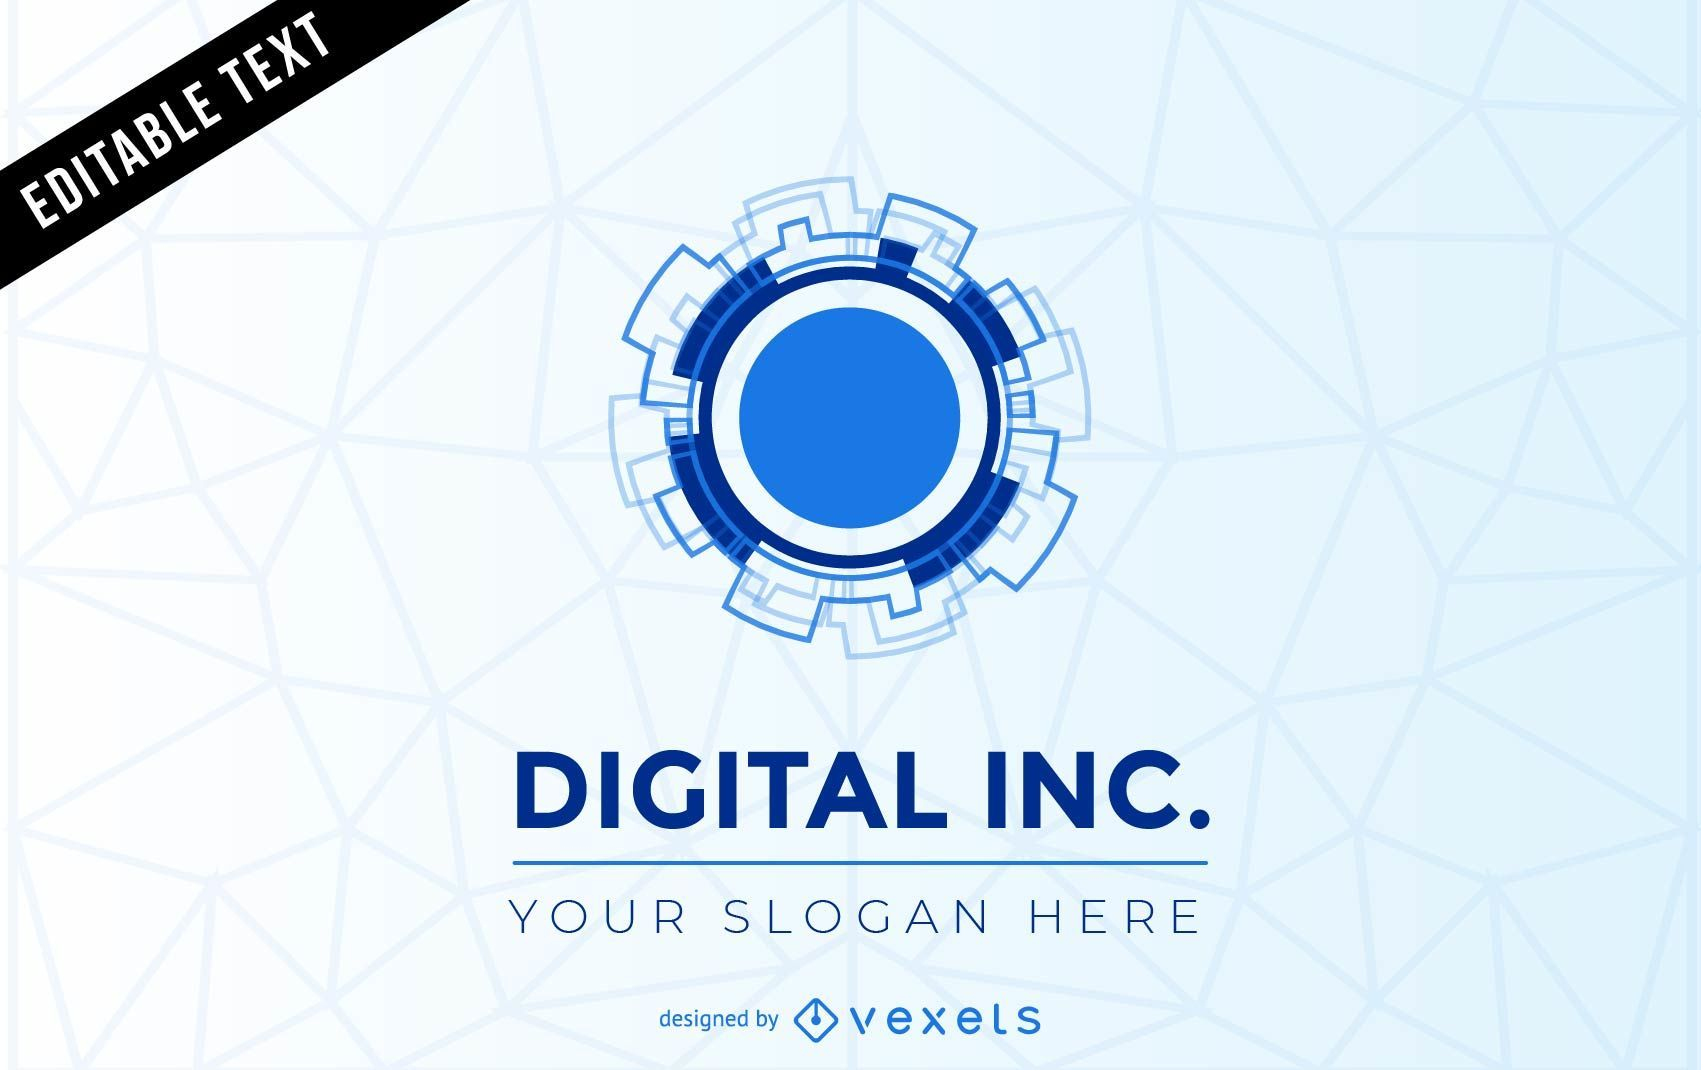 Digital inc logo template